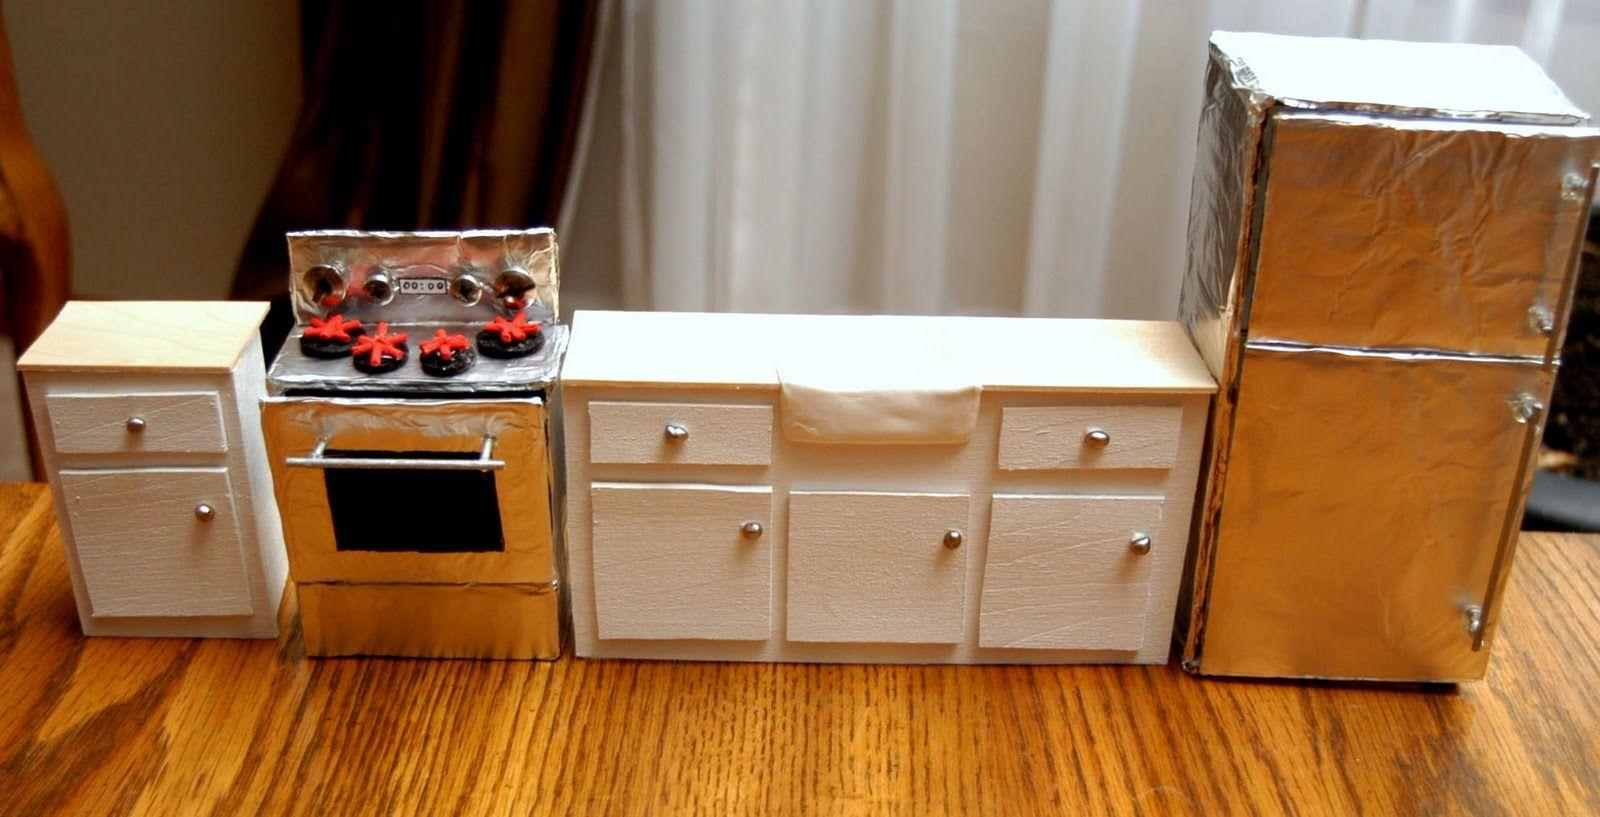 Dhkitchen4 Jpg 1600 817 Diy Dollhouse Furniture Diy Cardboard Furniture Miniature Dollhouse Furniture